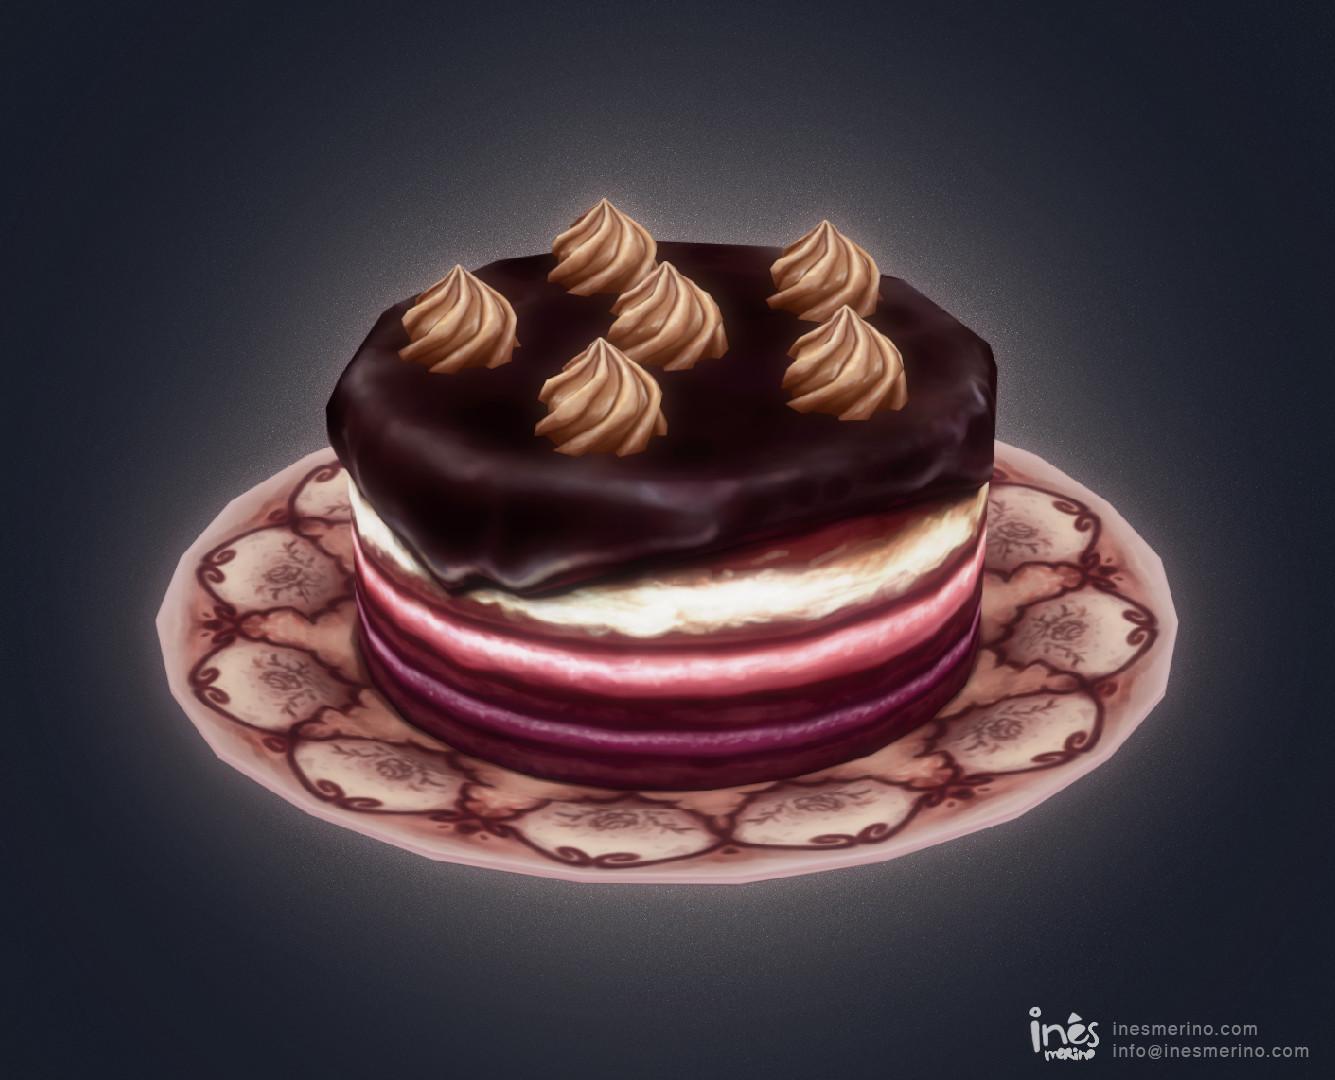 Ines merino 1806 cake02 presentation1